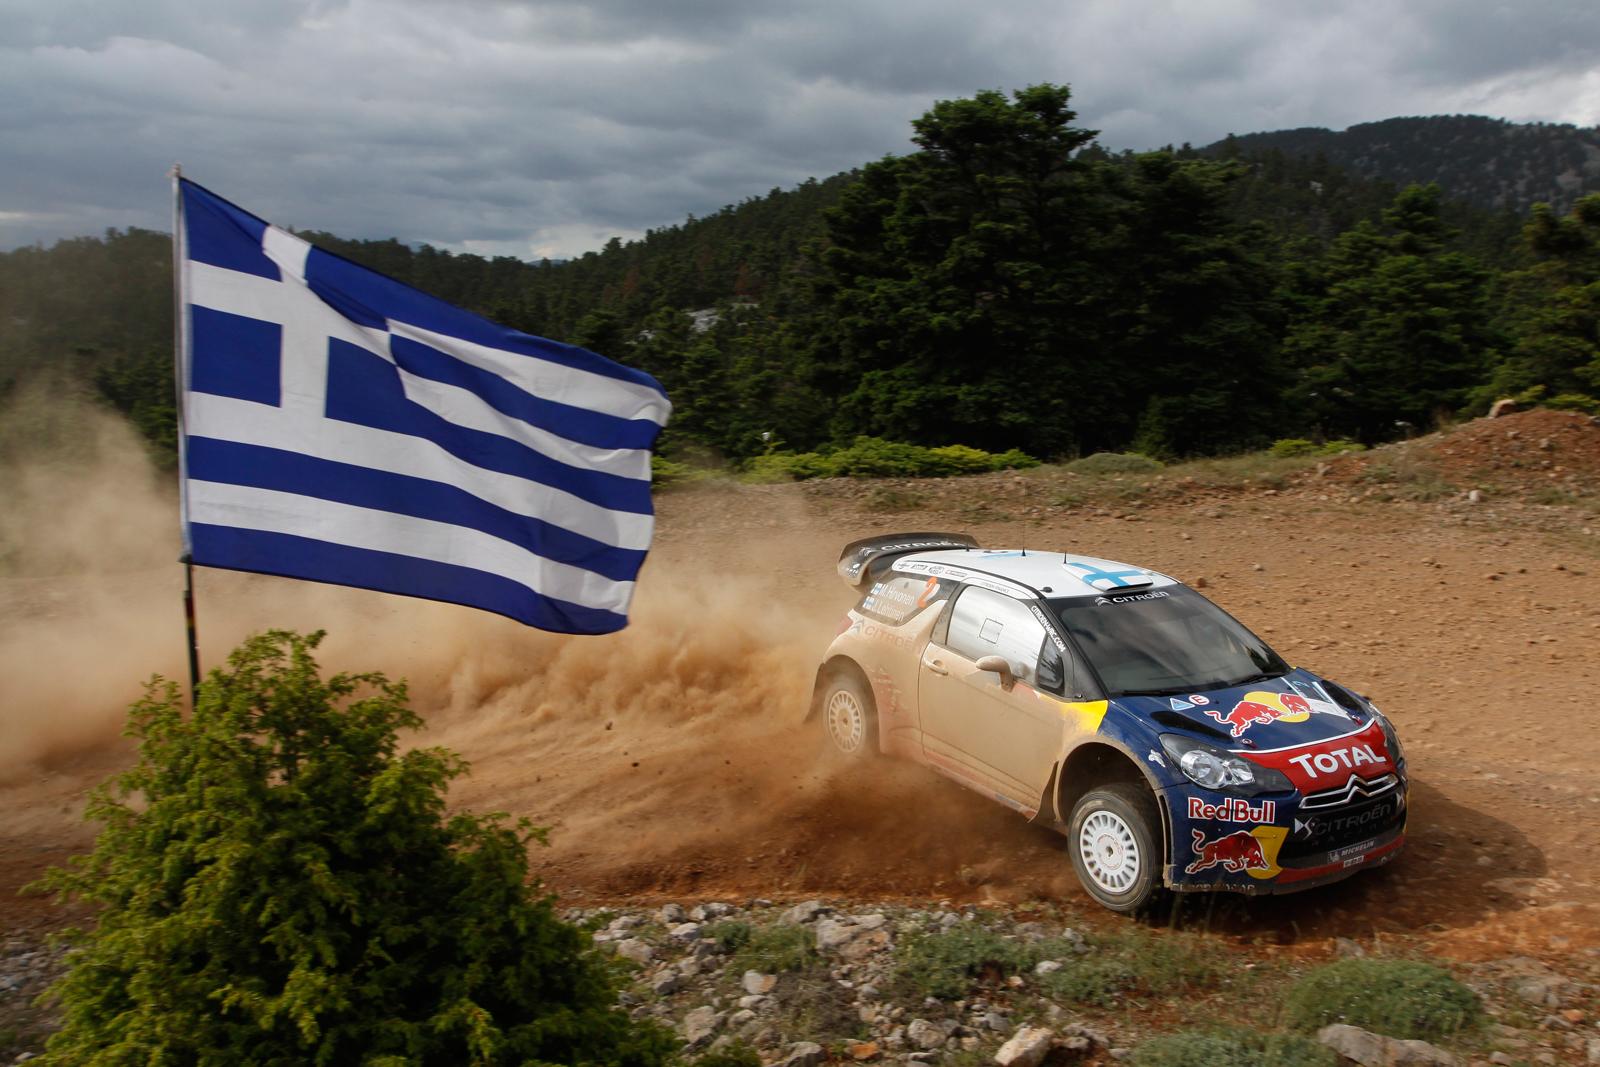 acropolis1 1 Μπορεί το Ράλι Ακρόπολις να ξαναβρεί τη χαμένη αίγλη του; Rally Acropolis, Seajets rally acropolis, zblog, Ακρόπολις, ράλι